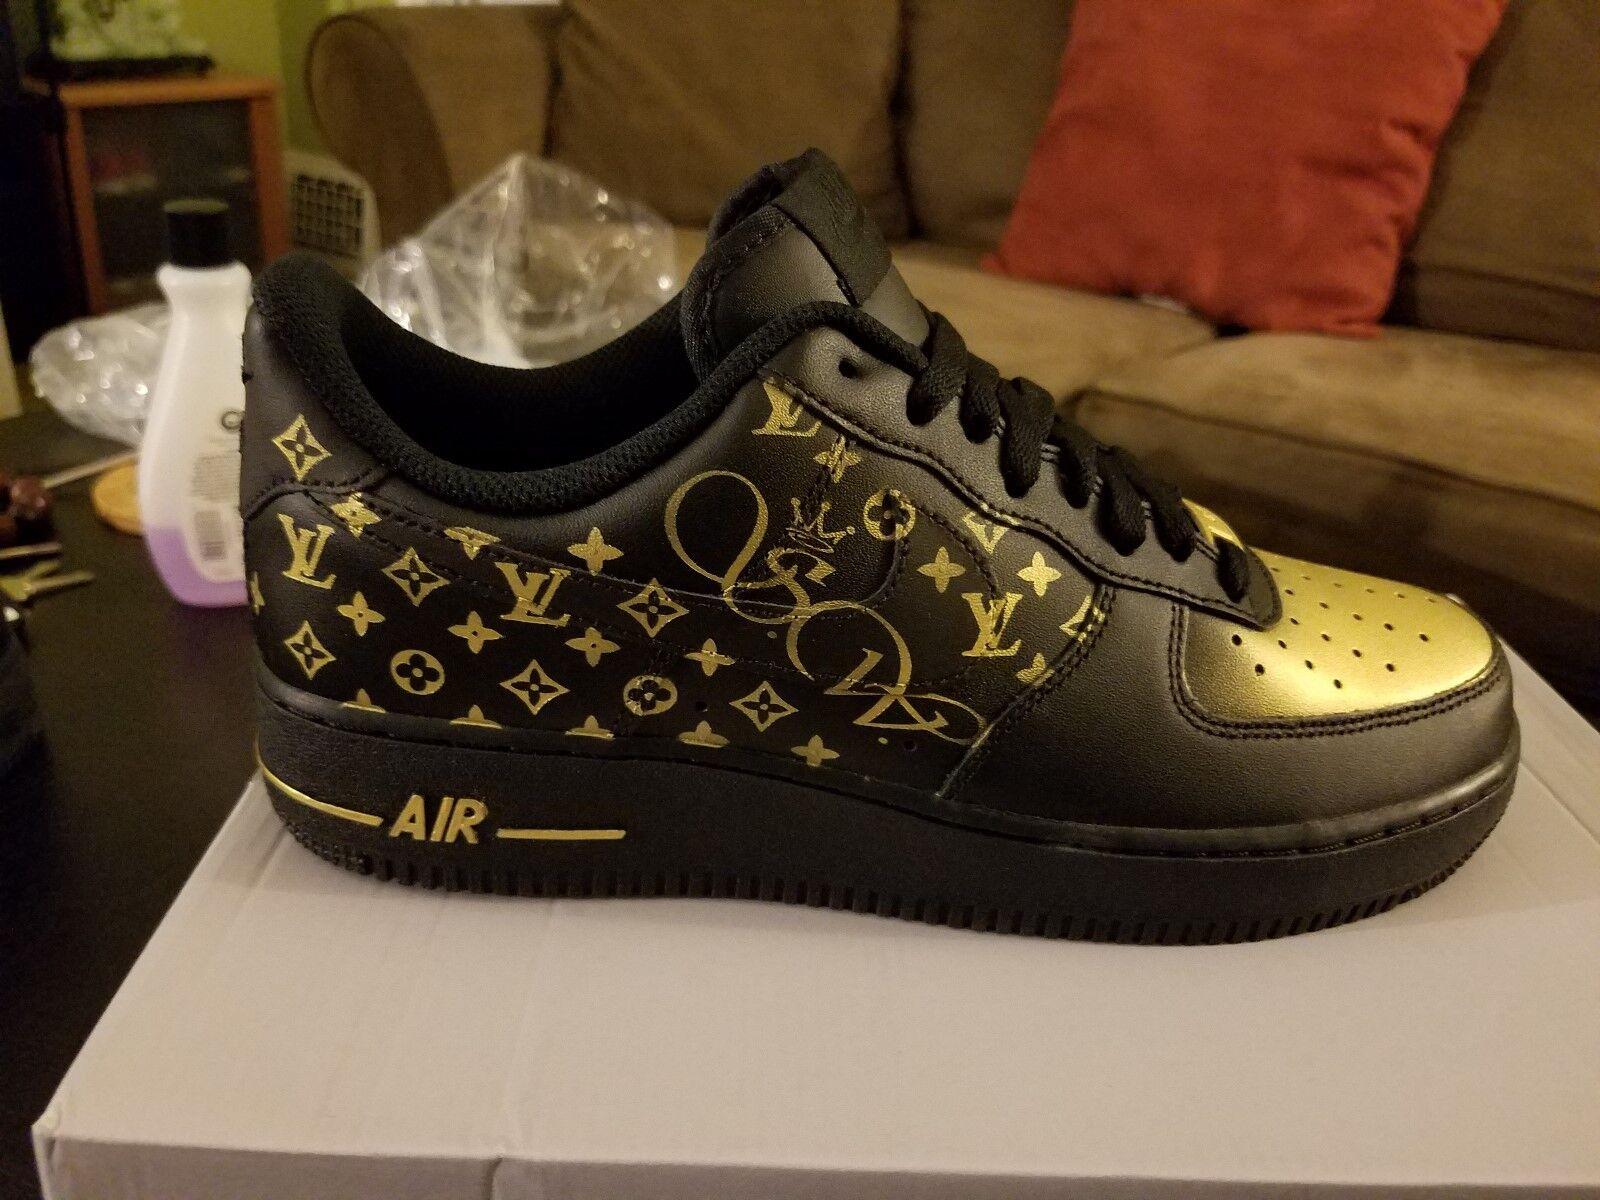 Air Force 1 Negro oro Personalizado 1 Par